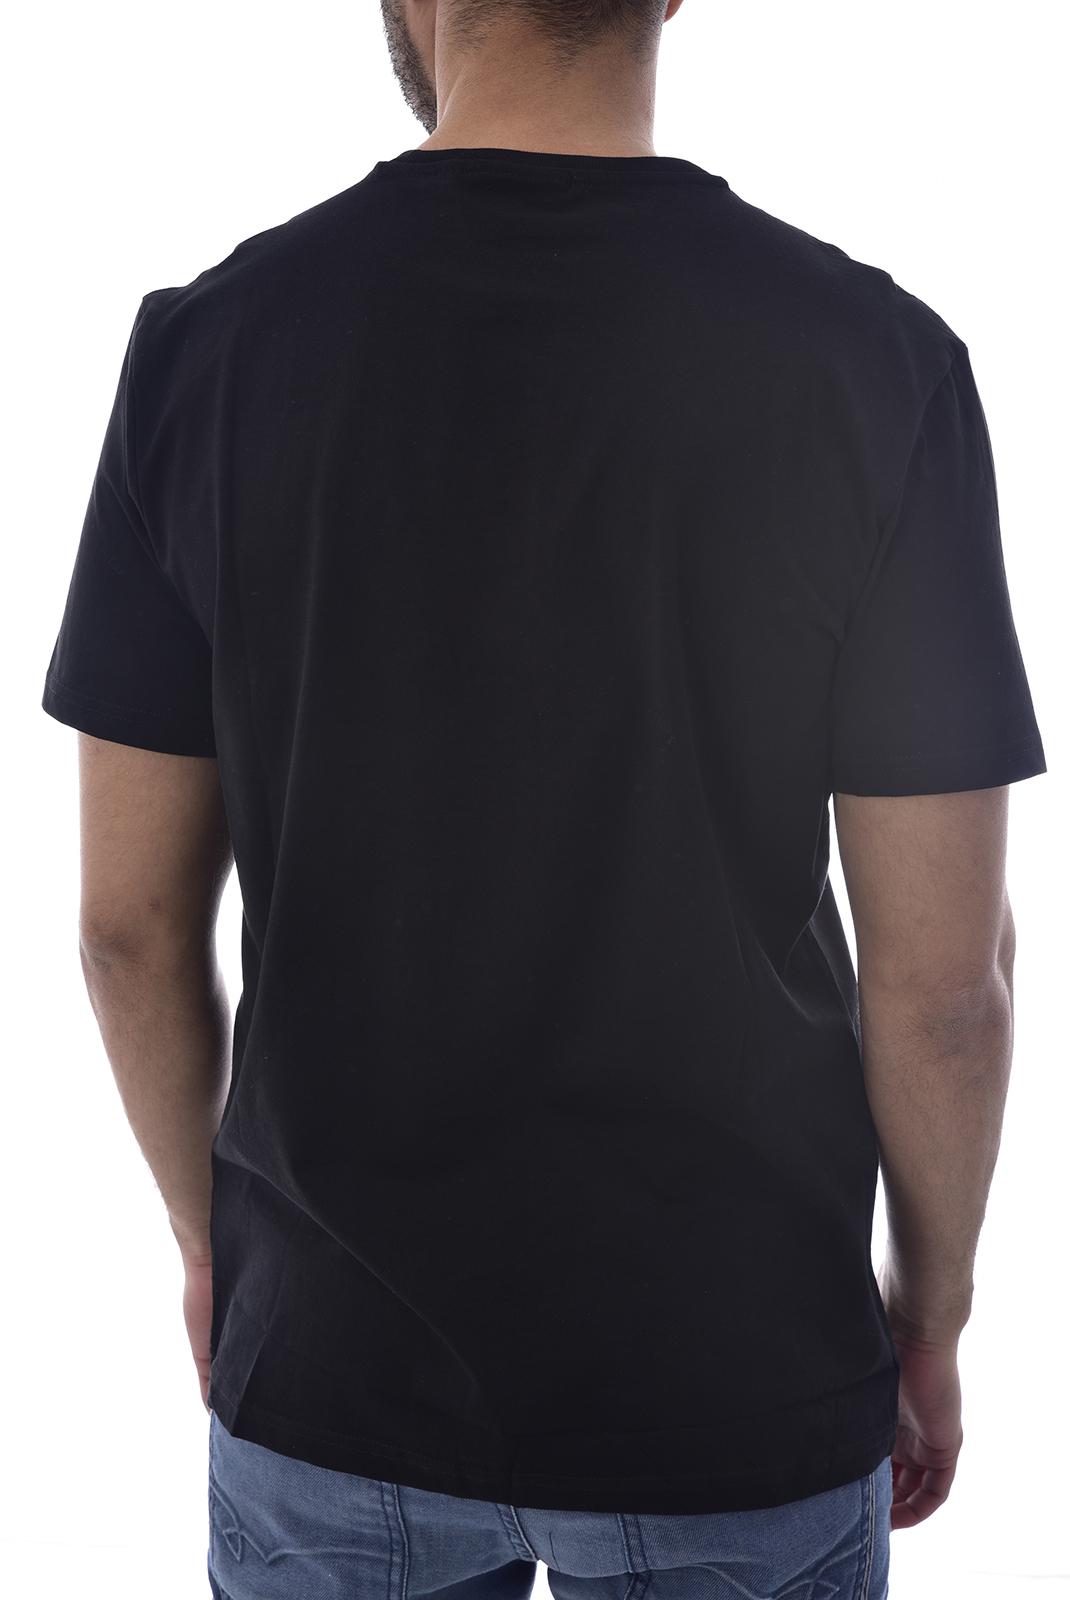 Tee-shirts  Kaporal PASTO BLACK